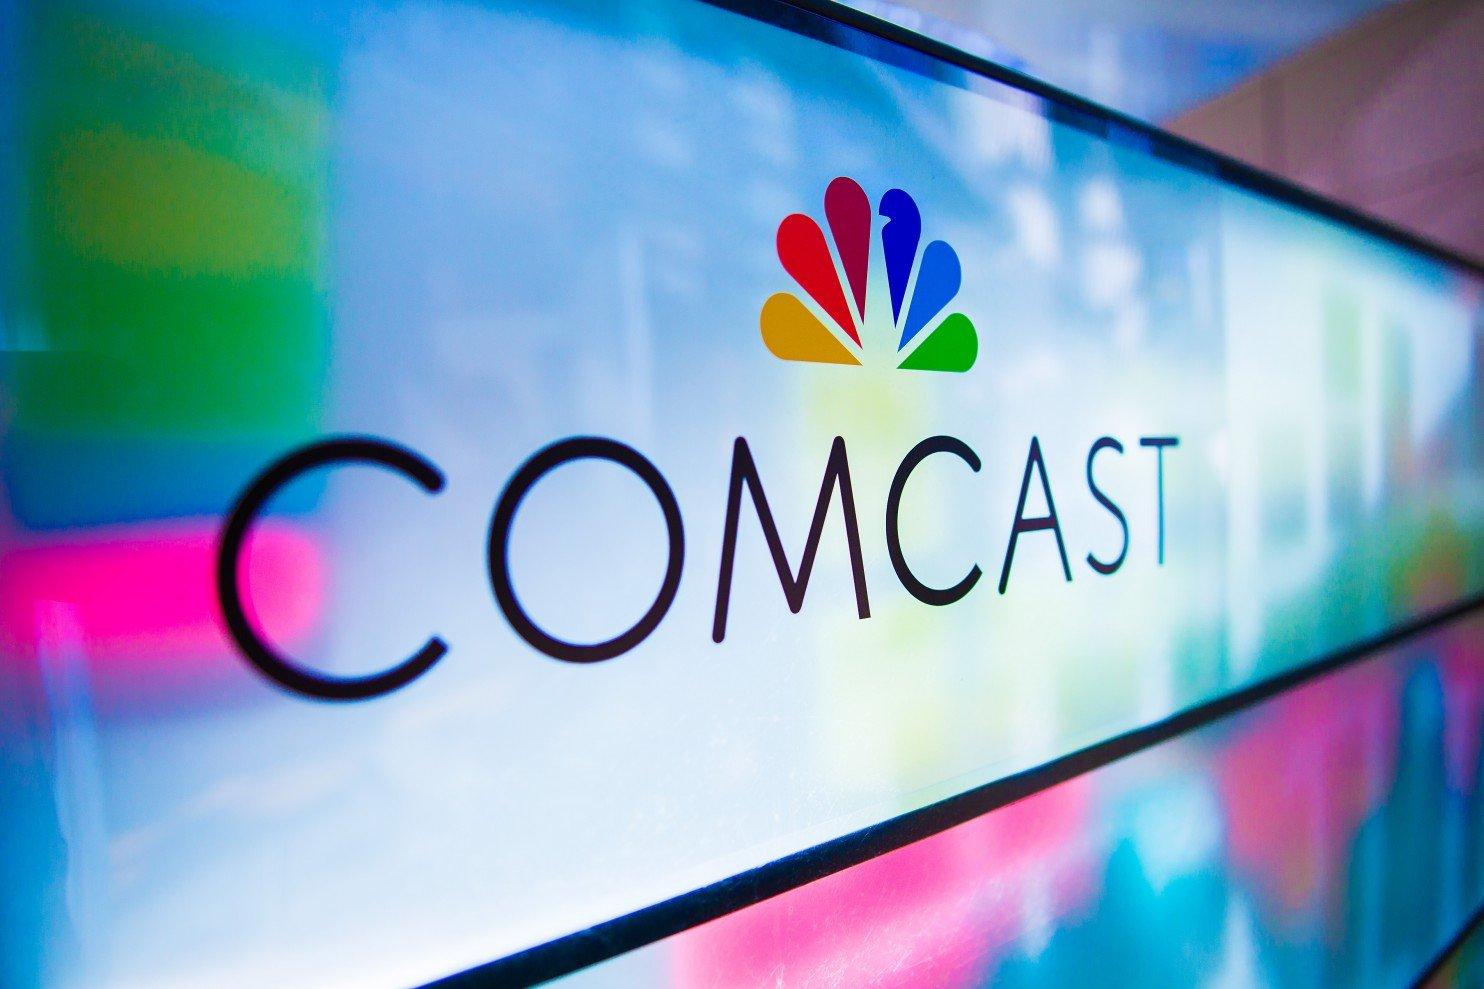 publicidad, tv, television, anuncios, blockchain, disney, nbcuniversal, disney, altice usa, canal 4, cox communications, mediaset italia y tf1, comcast